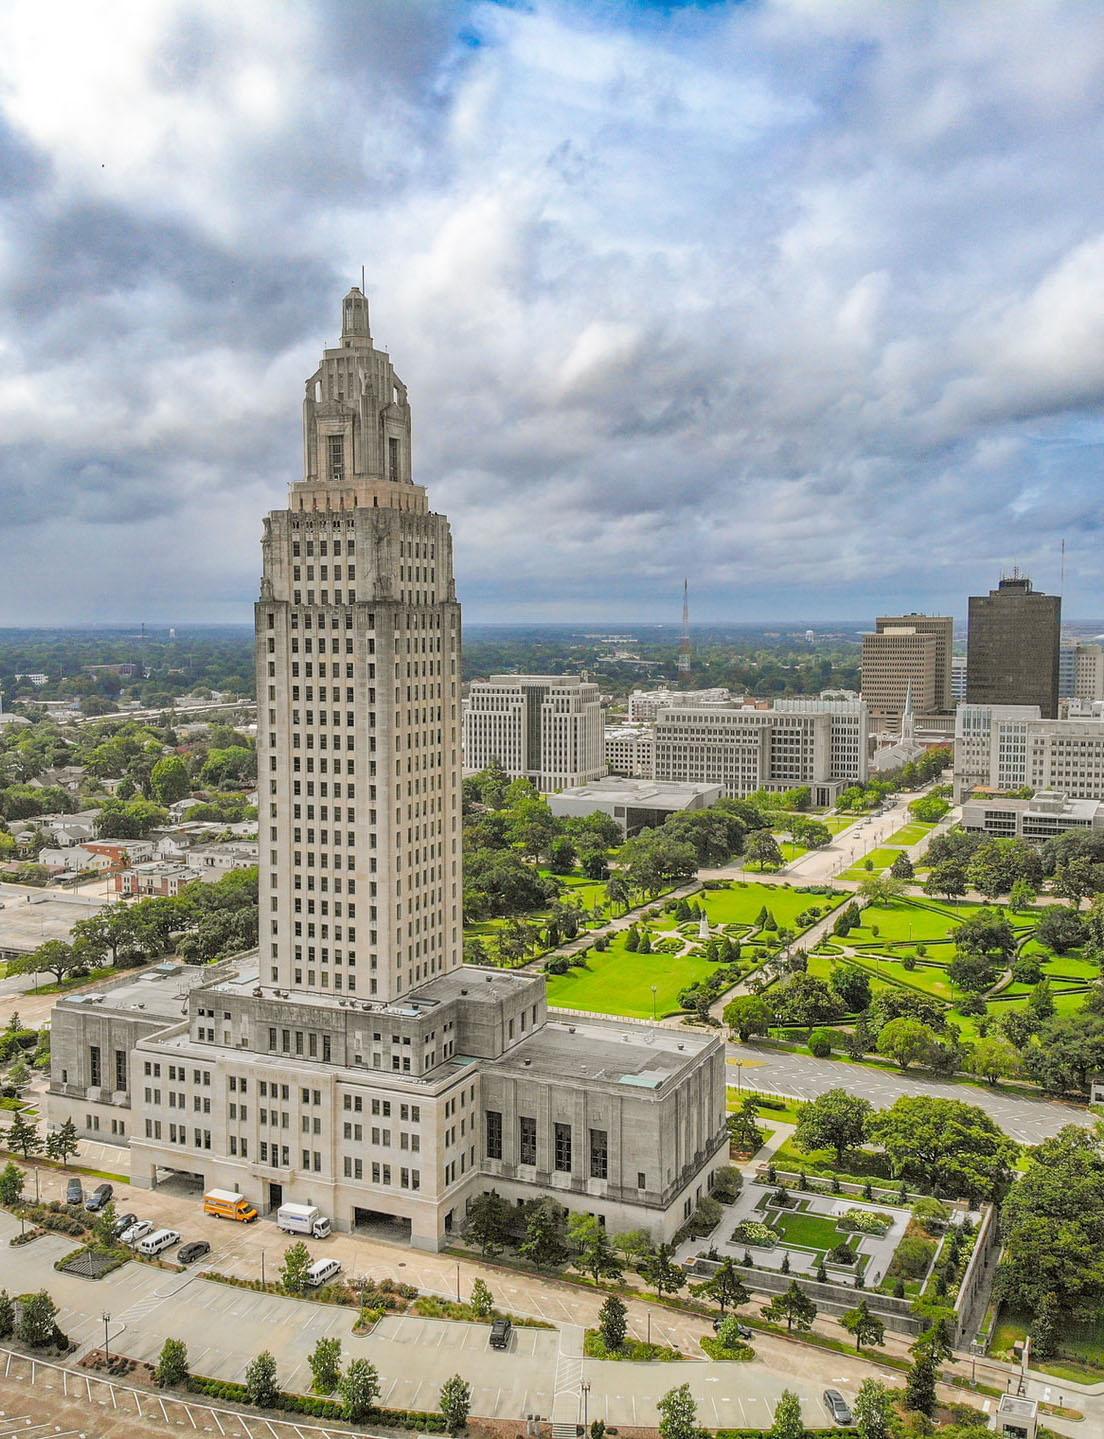 Aerial shot of the Louisiana State Capital